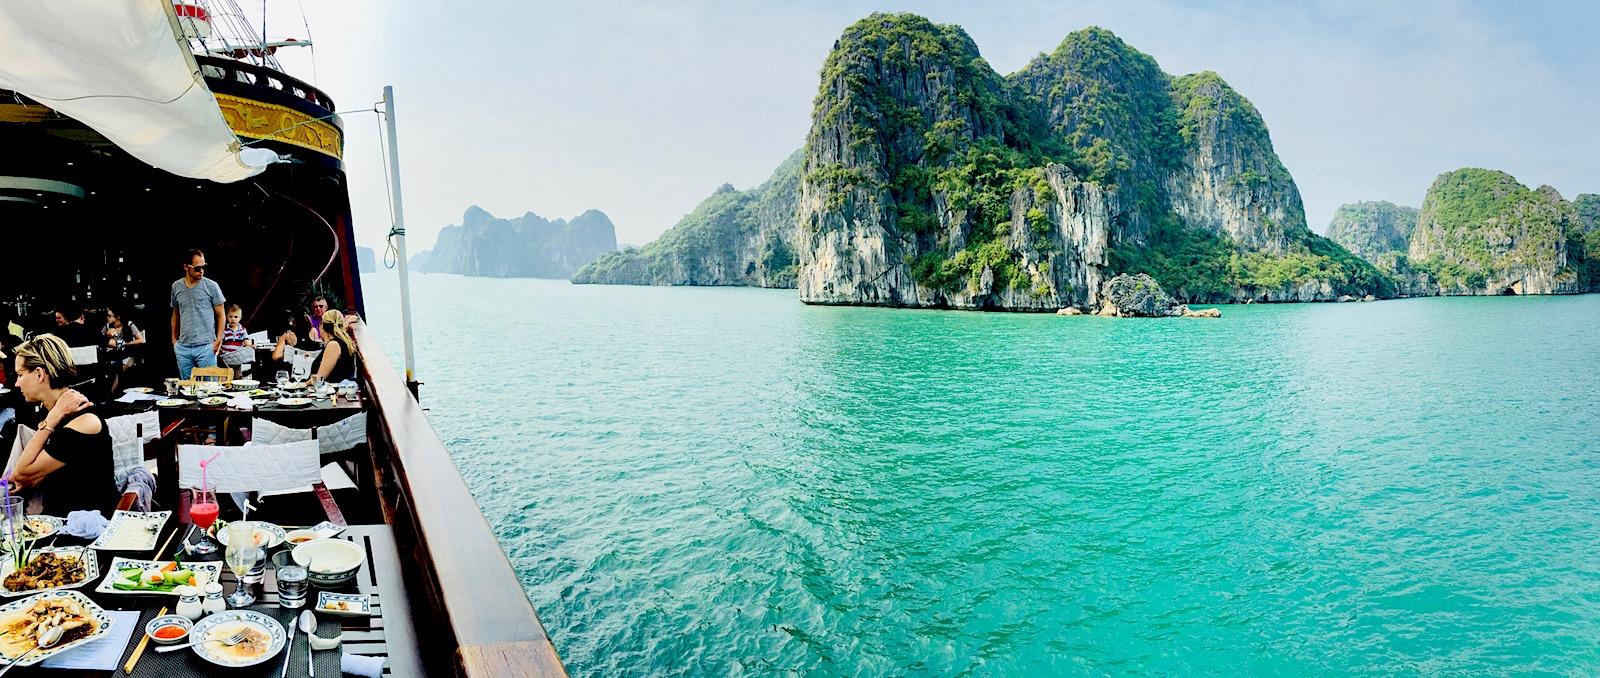 Cruzeiro em Bai Tu long, Halong Bay, Vietnã. Foto: Patti Neves